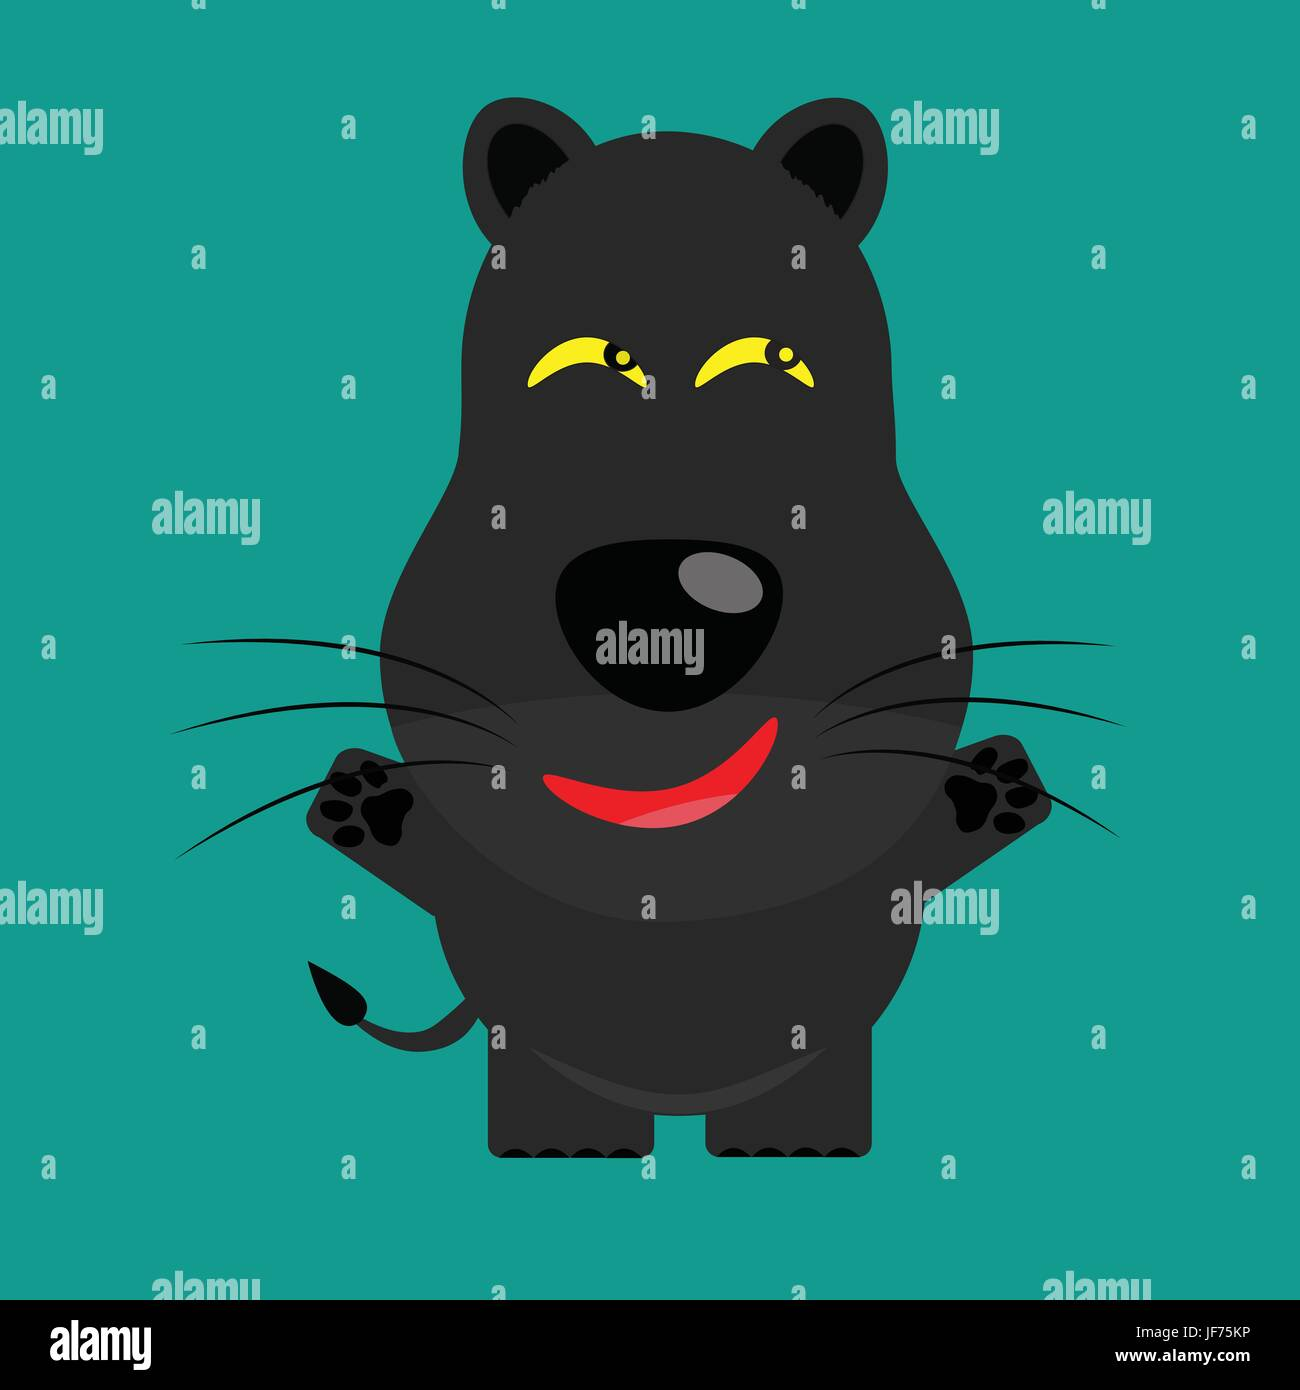 tricky black leopard gartoon character - Stock Image